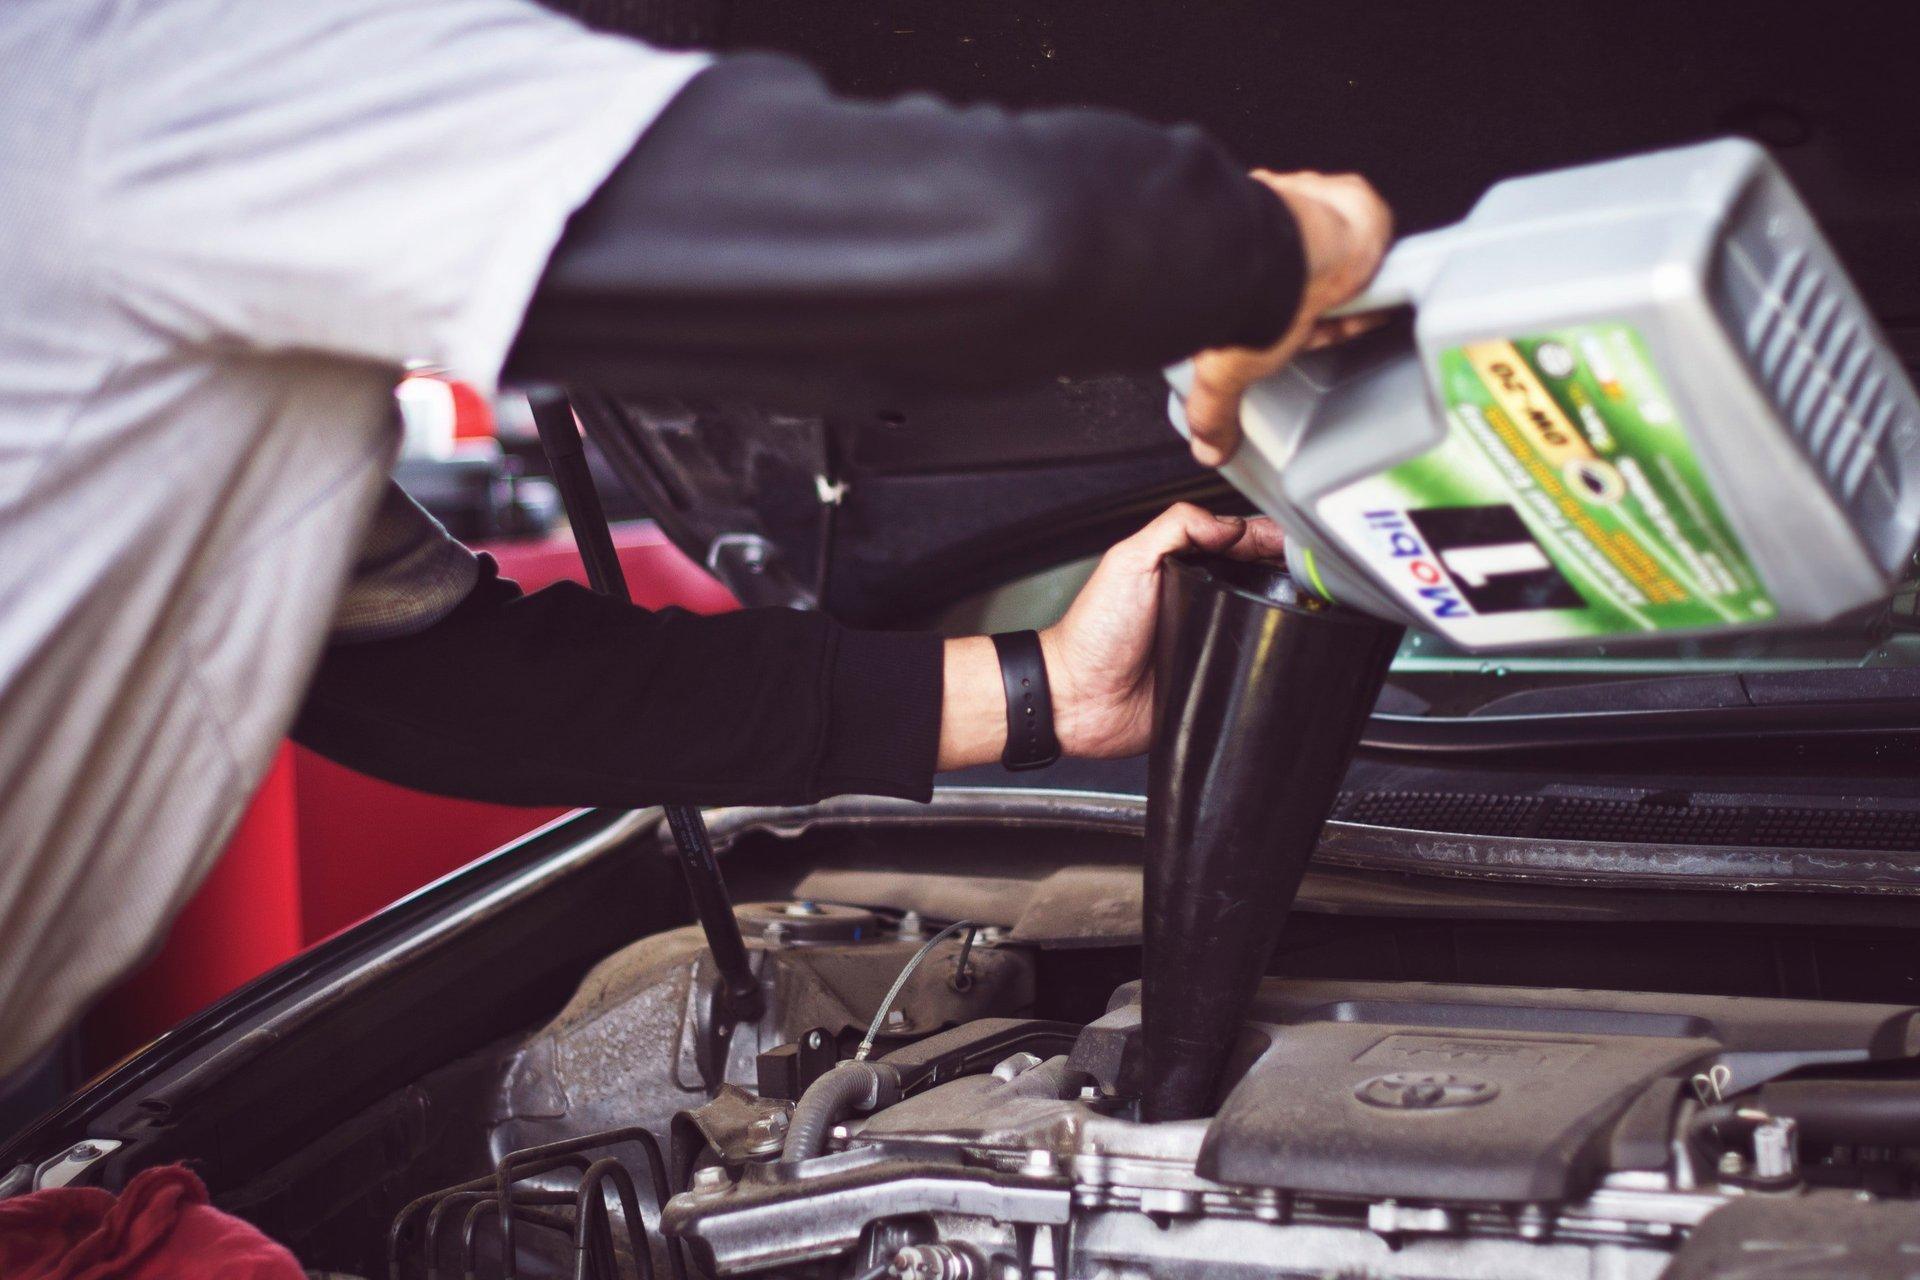 cambio olio auto